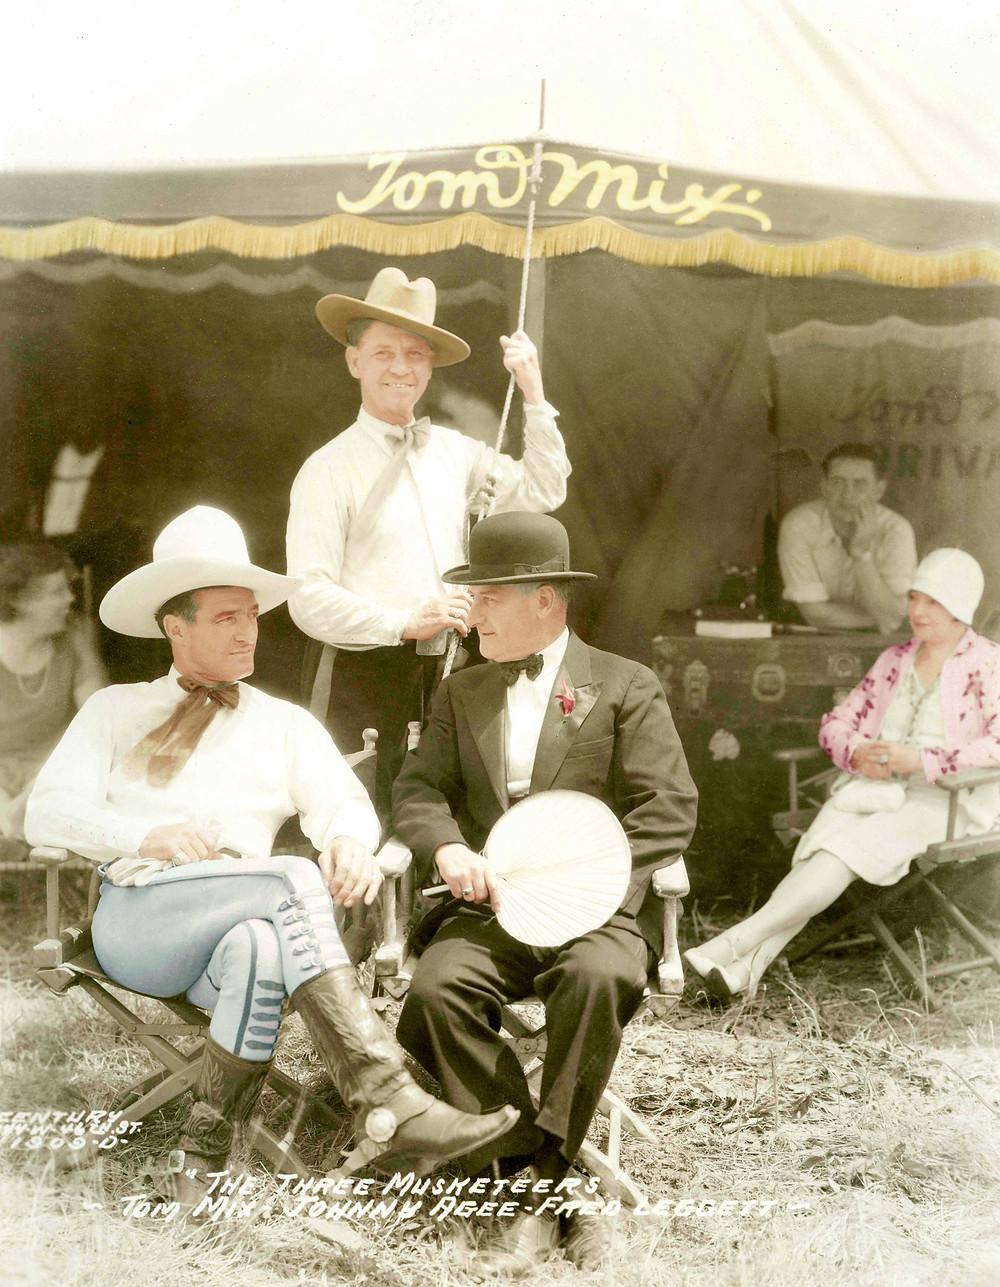 Tom Mix, Johnny Agee, Fred Leggett, Sells-Floto Circus